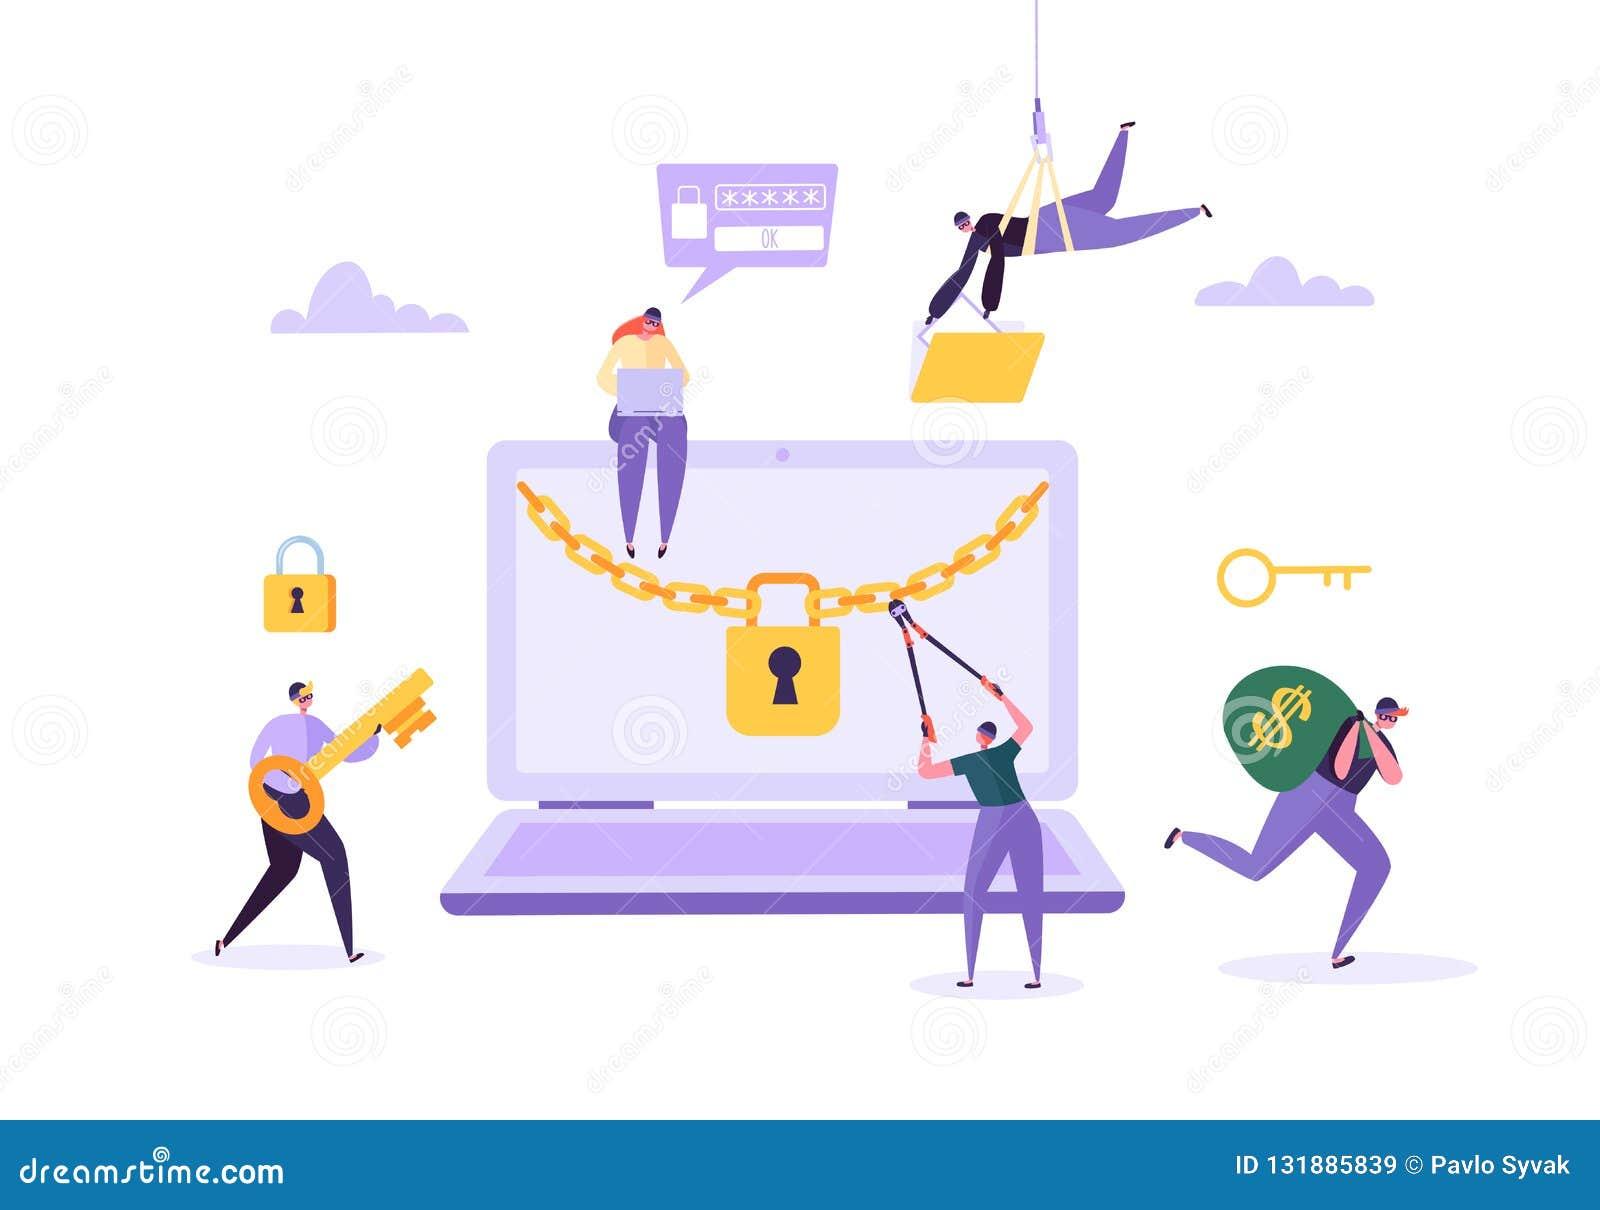 Hakker Stealing Wachtwoord en Geld van Laptop Dief Characters Hacking Computer Visserijaanval, Financiële Fraude